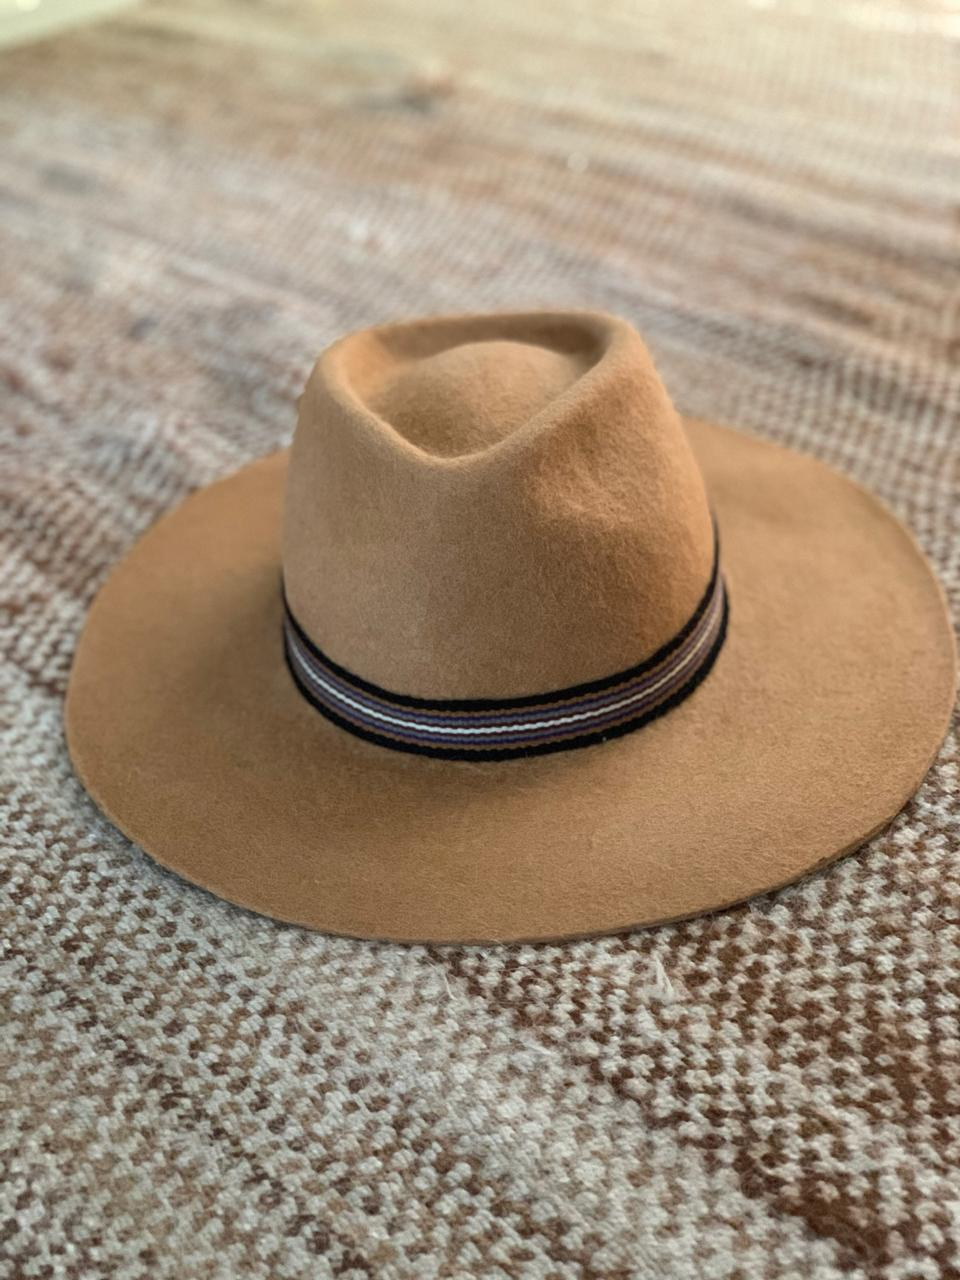 Cusco Camel 1 – 2